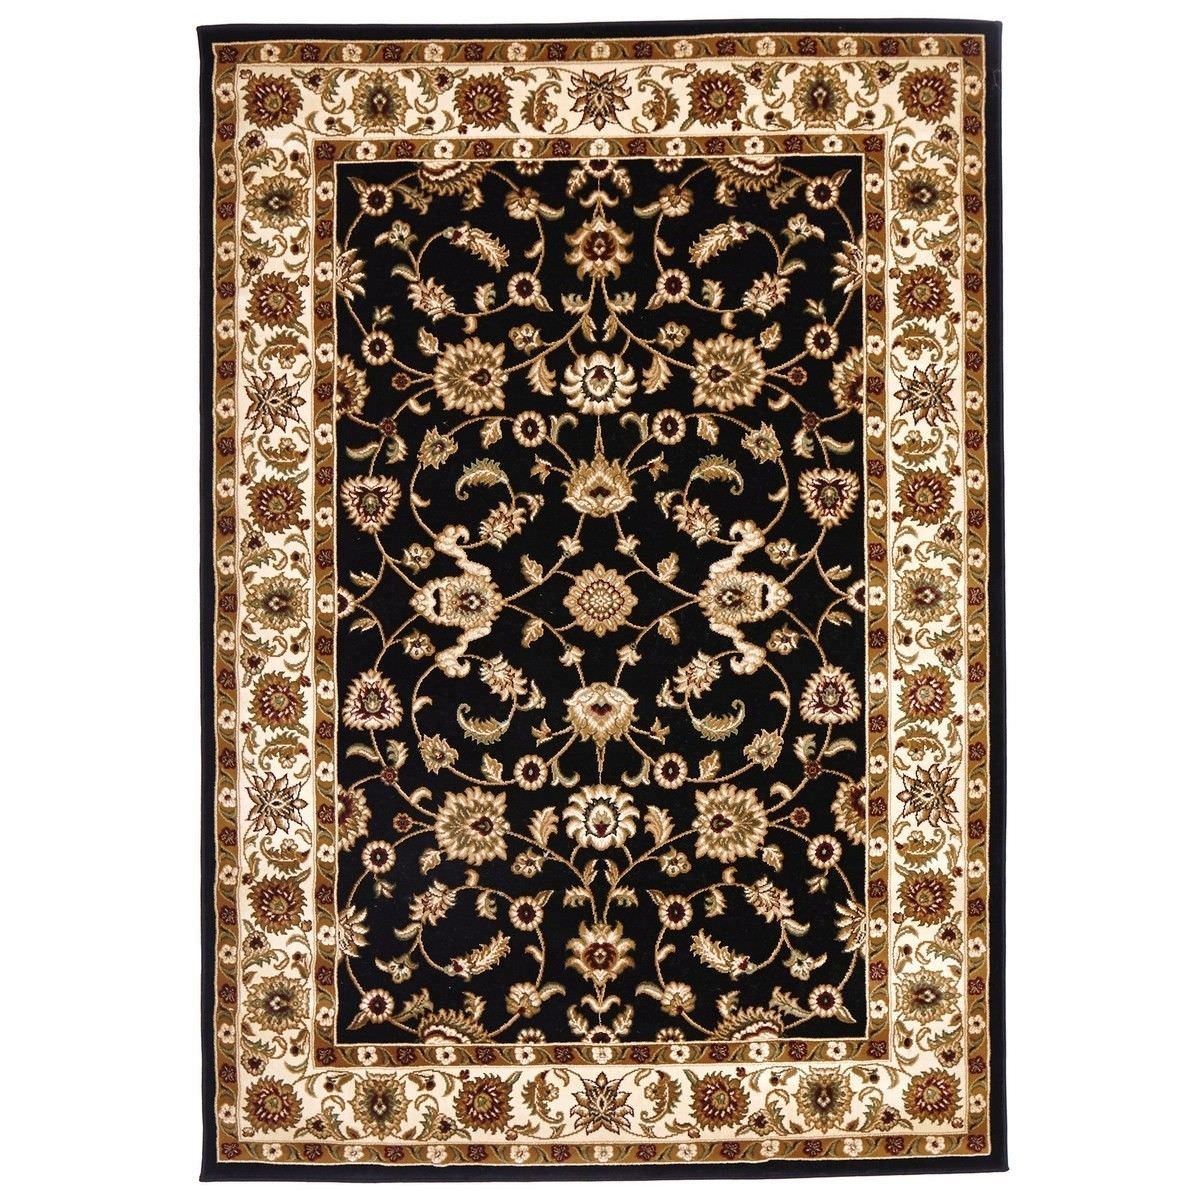 Sydney Classic Turkish Made Oriental Rug, 230x160cm, Black / Ivory